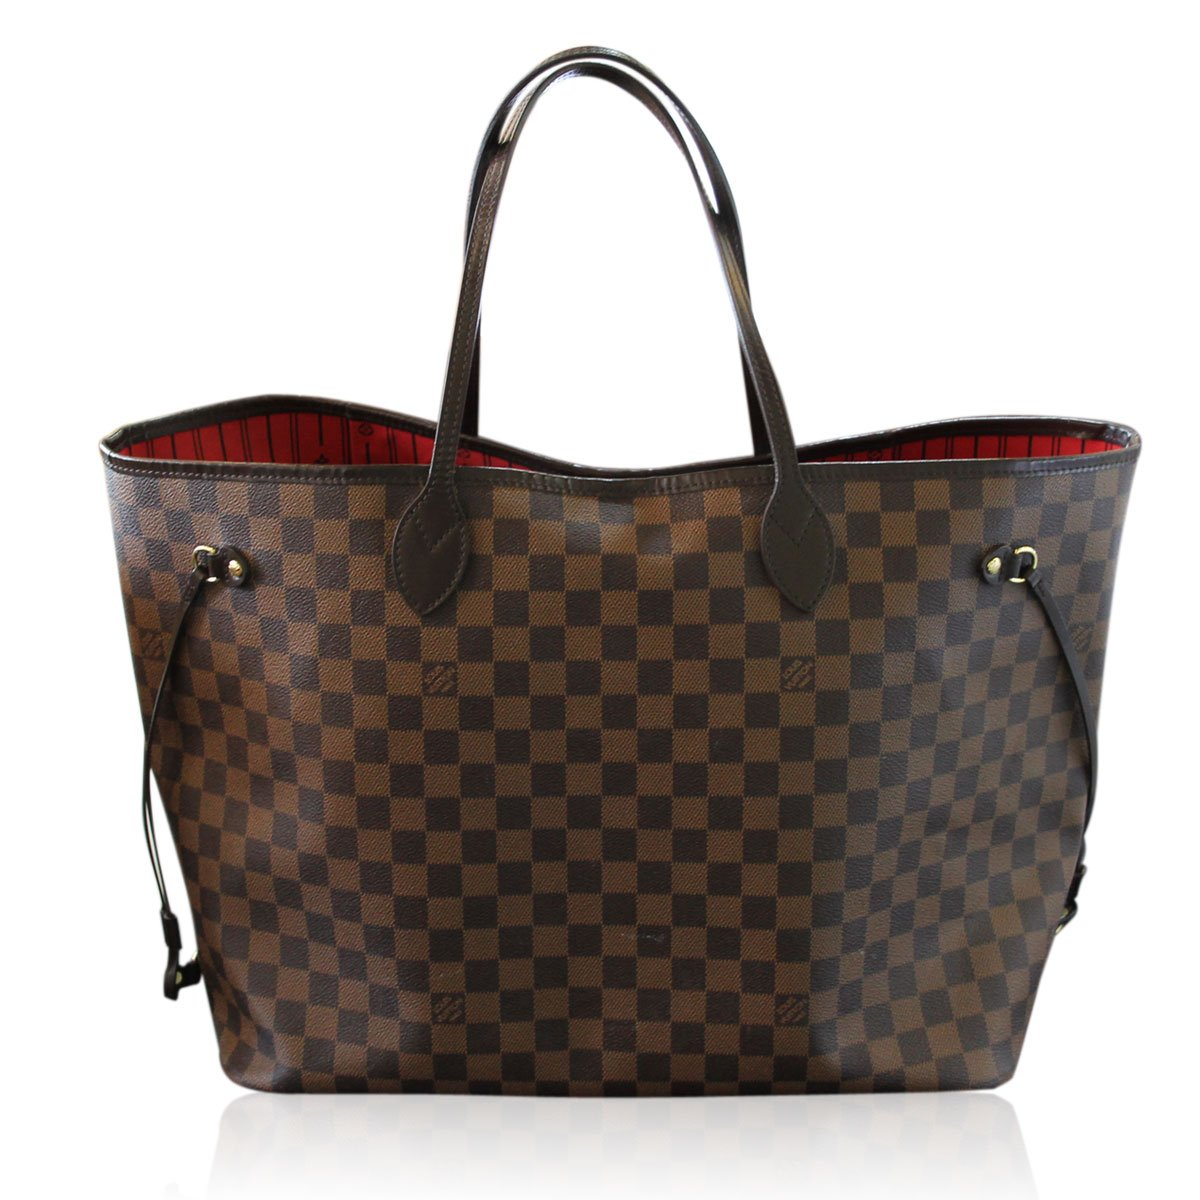 Neverfull Style Canvas Woman Organizer Handbag Damier Tote Shoulder Fashion Bag GM Size by LAMB